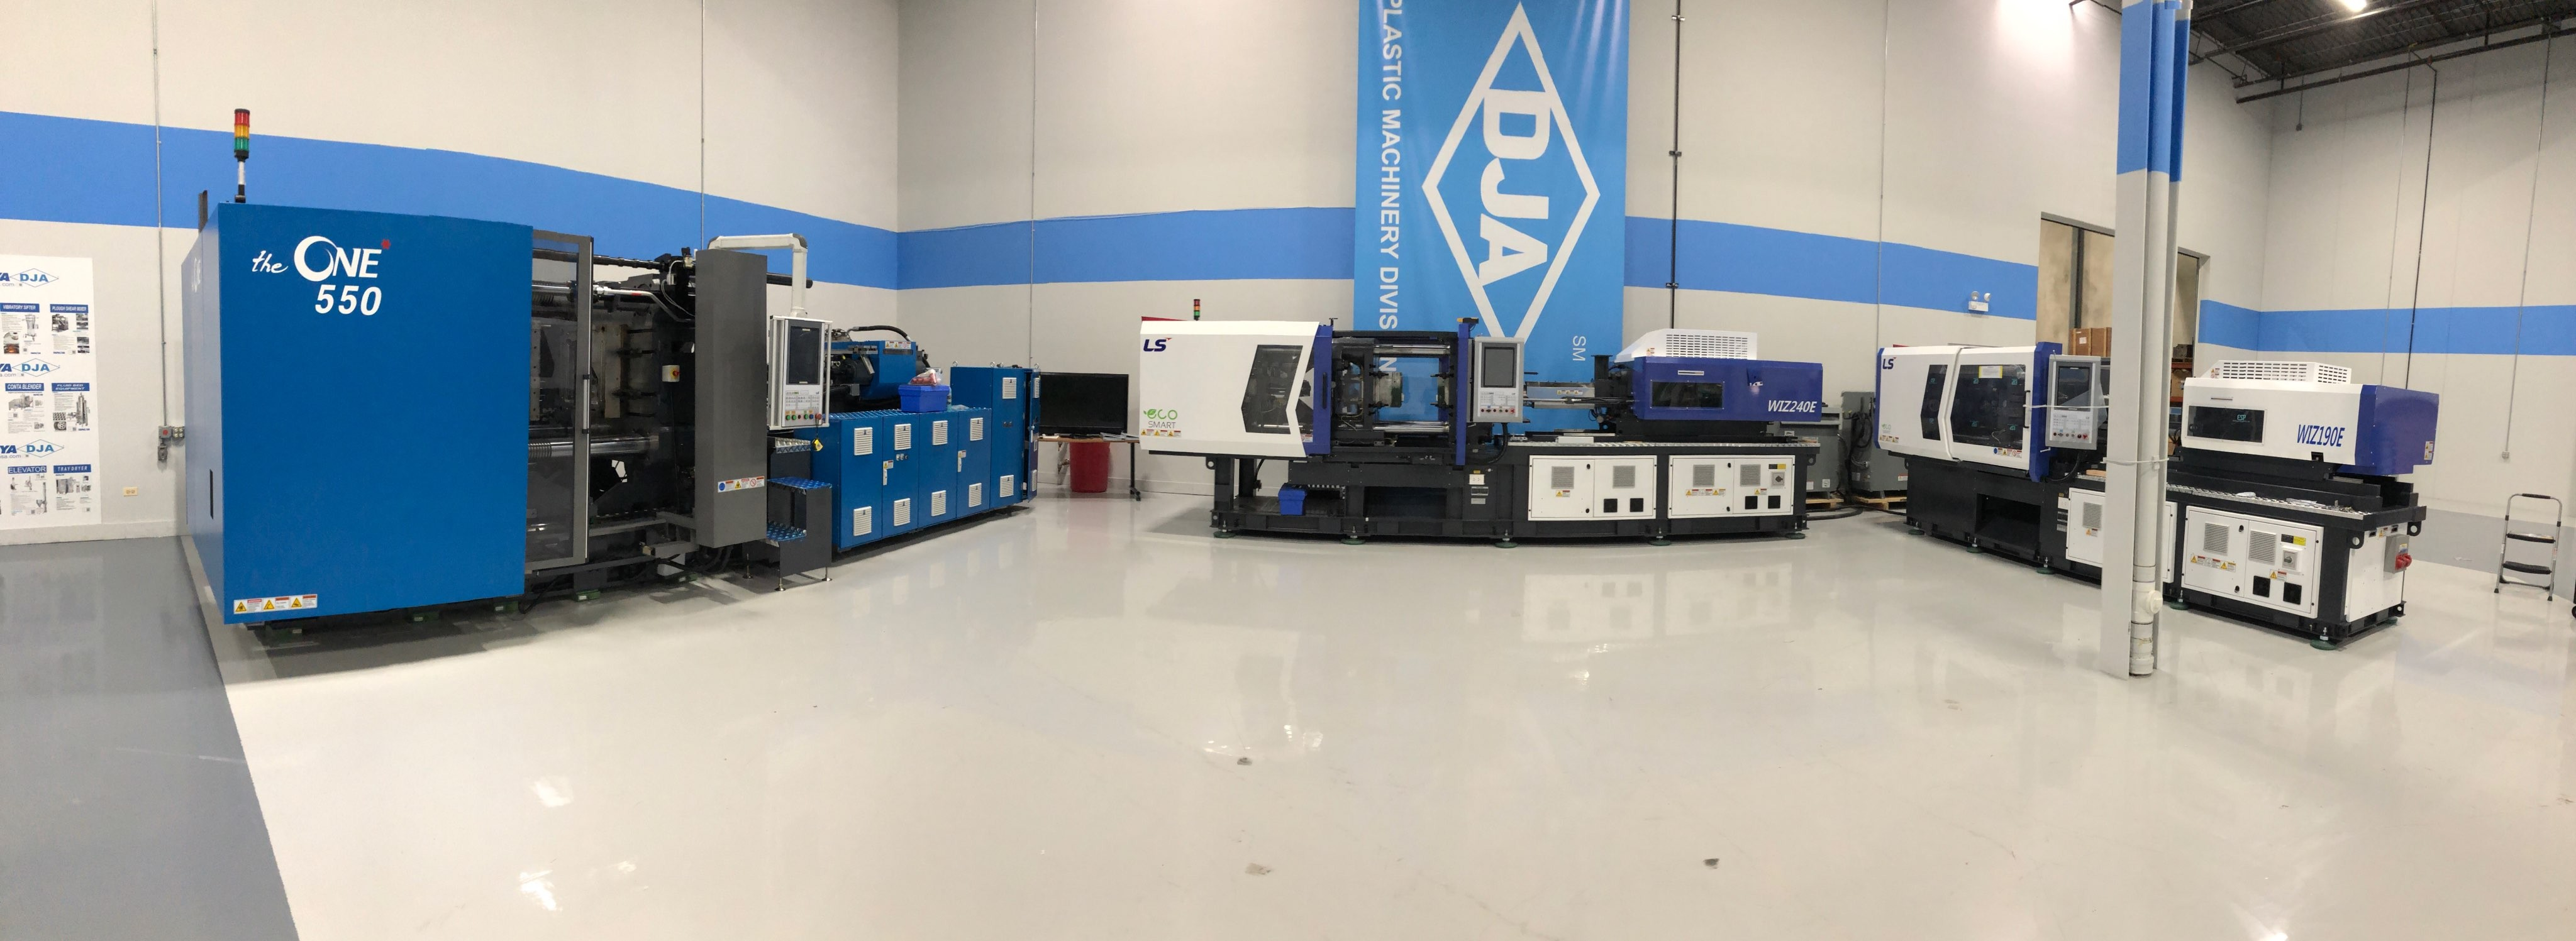 DJA - Plastic Machinery Division | LinkedIn